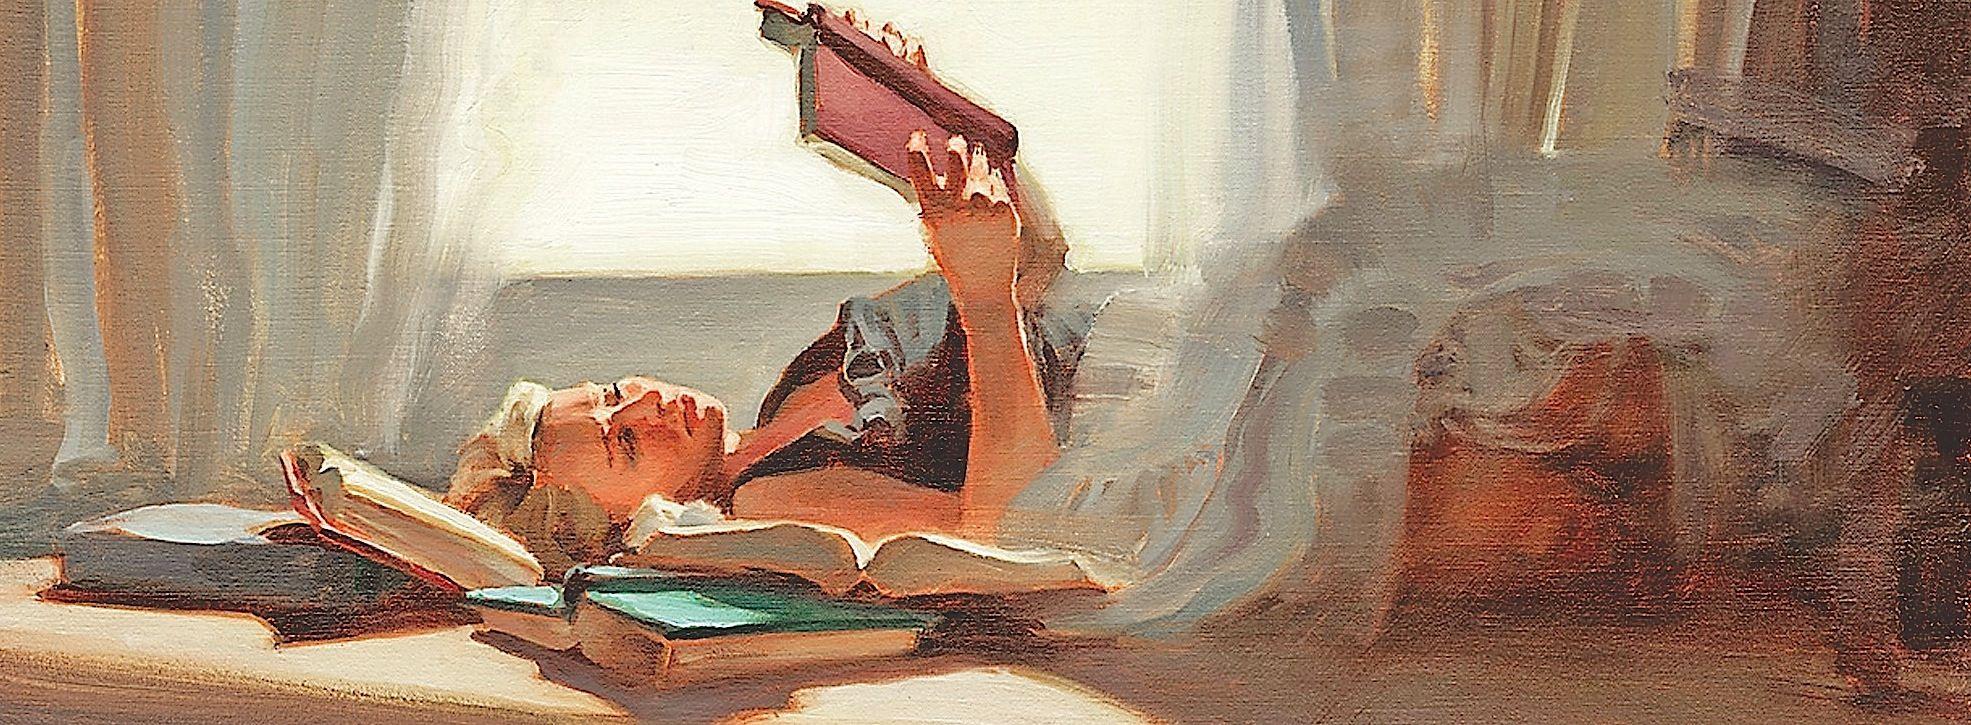 Charleston City Paper | Image Archives | CFADA's Fine Art Annual raises funds for high school art classes